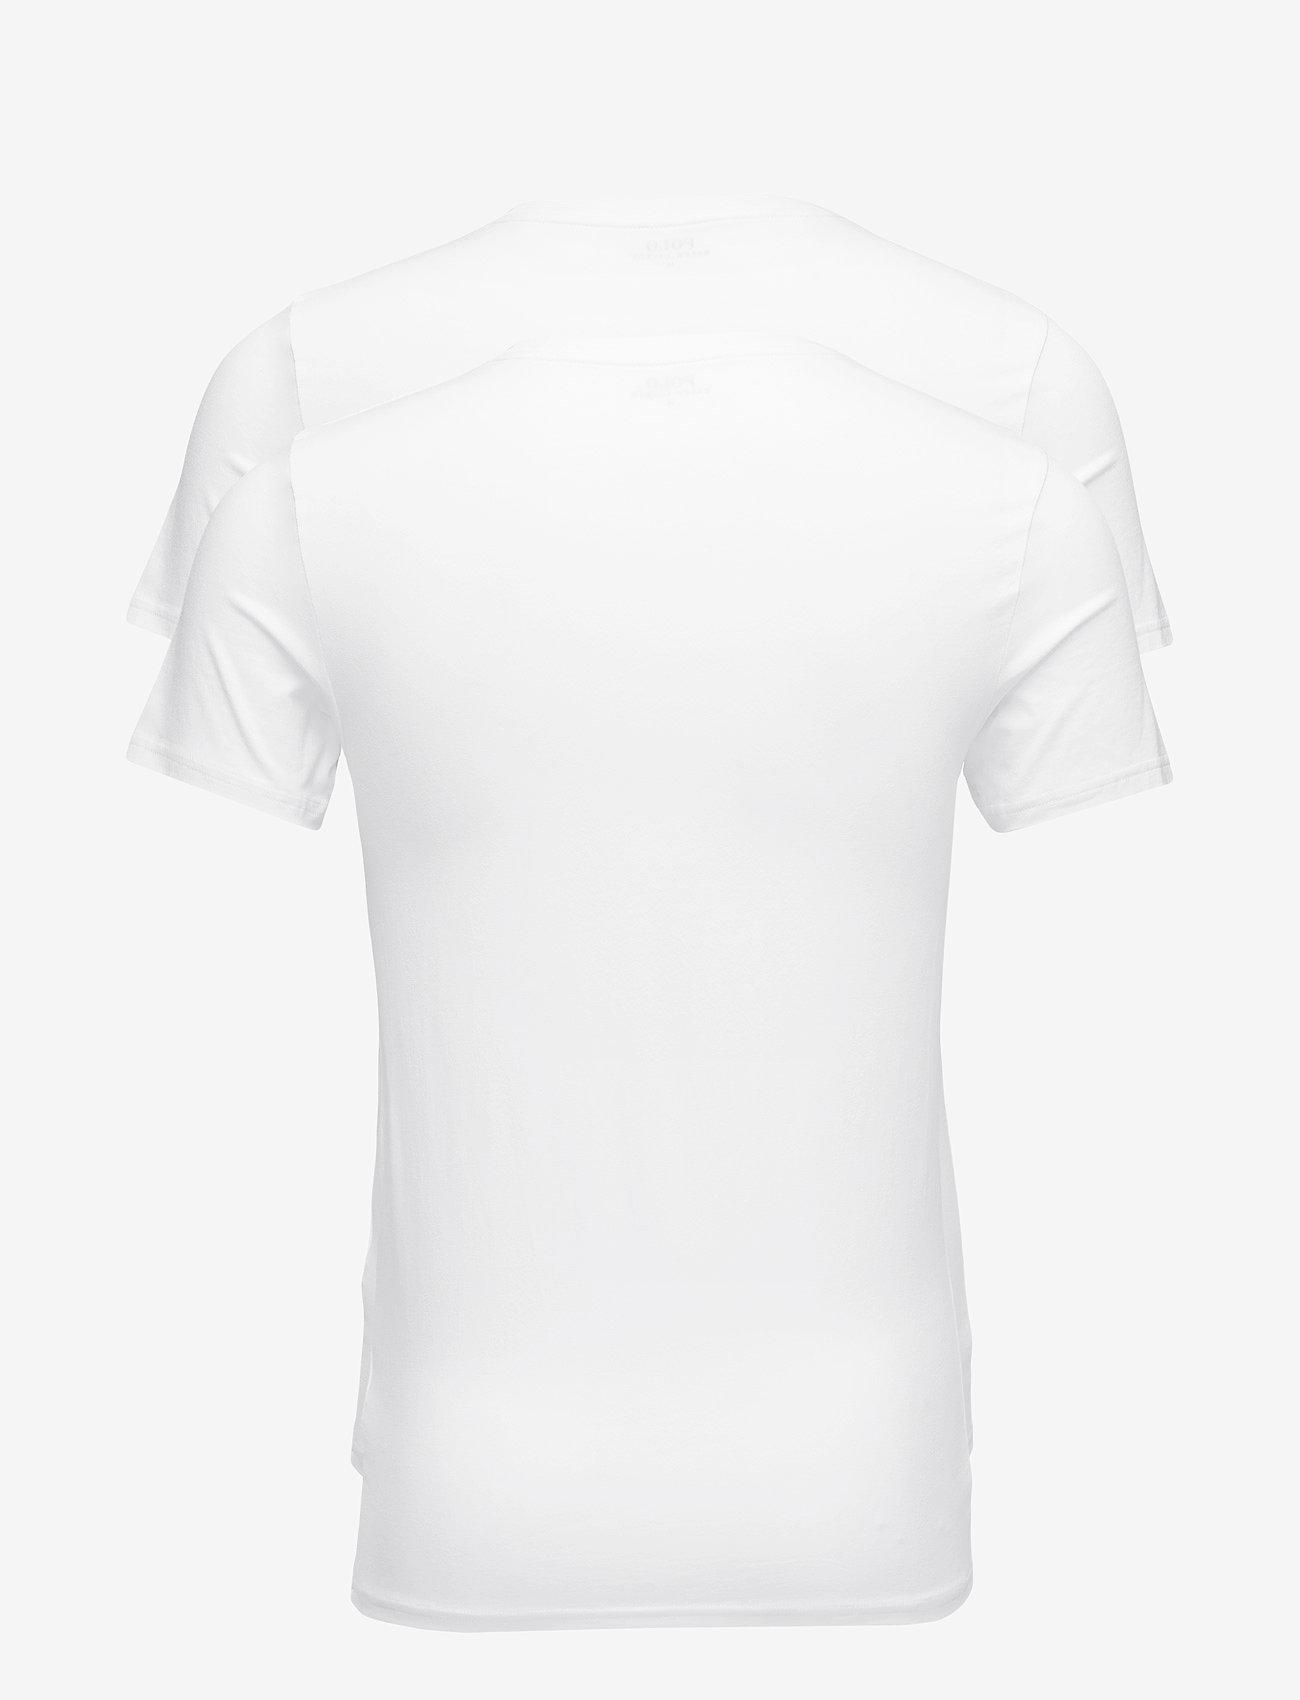 Polo Ralph Lauren Underwear - Crewneck T-Shirt 2-Pack - multipack - 2pk white/white - 1